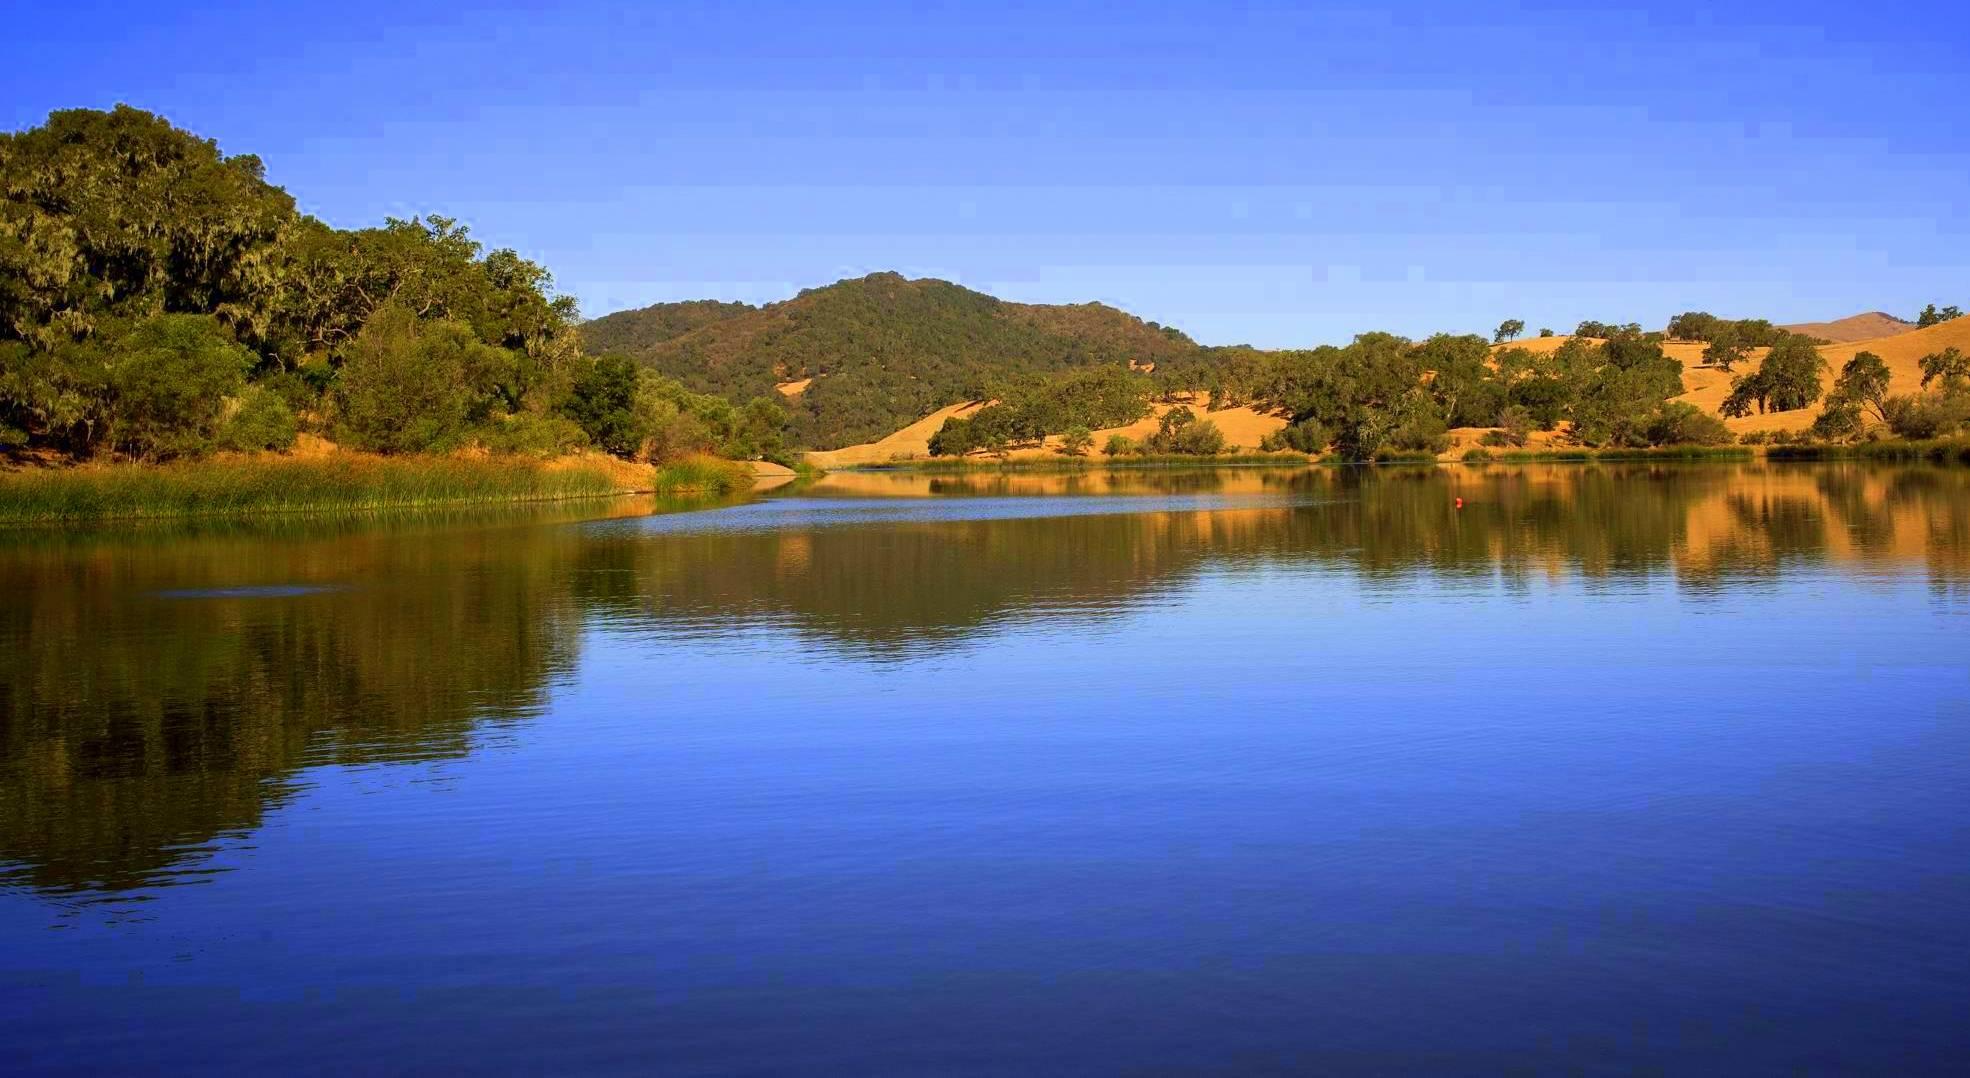 Alisal Lake - Alisal Guest Ranch and Resort